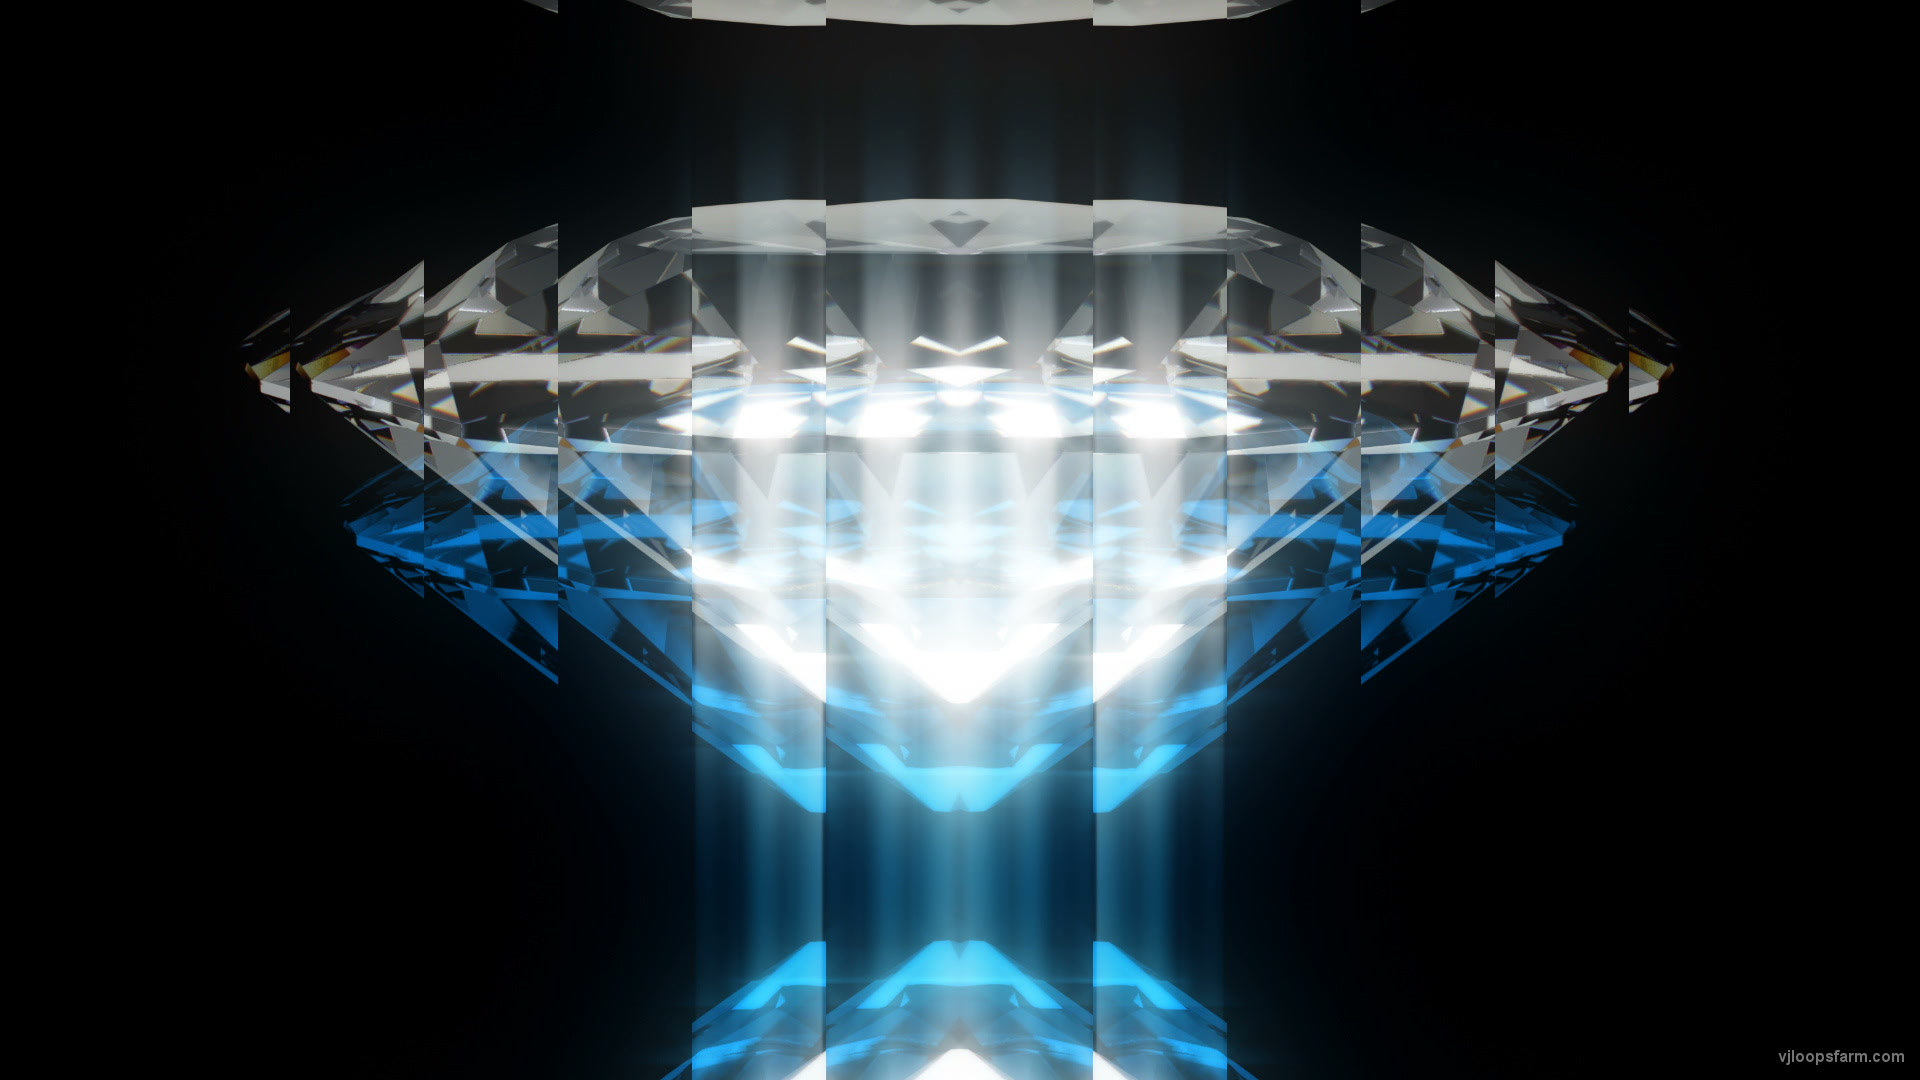 vj video background Shine-Like-a-Diamond-in-Full-HD-Video-Art-Blue-Vj-Loop_003